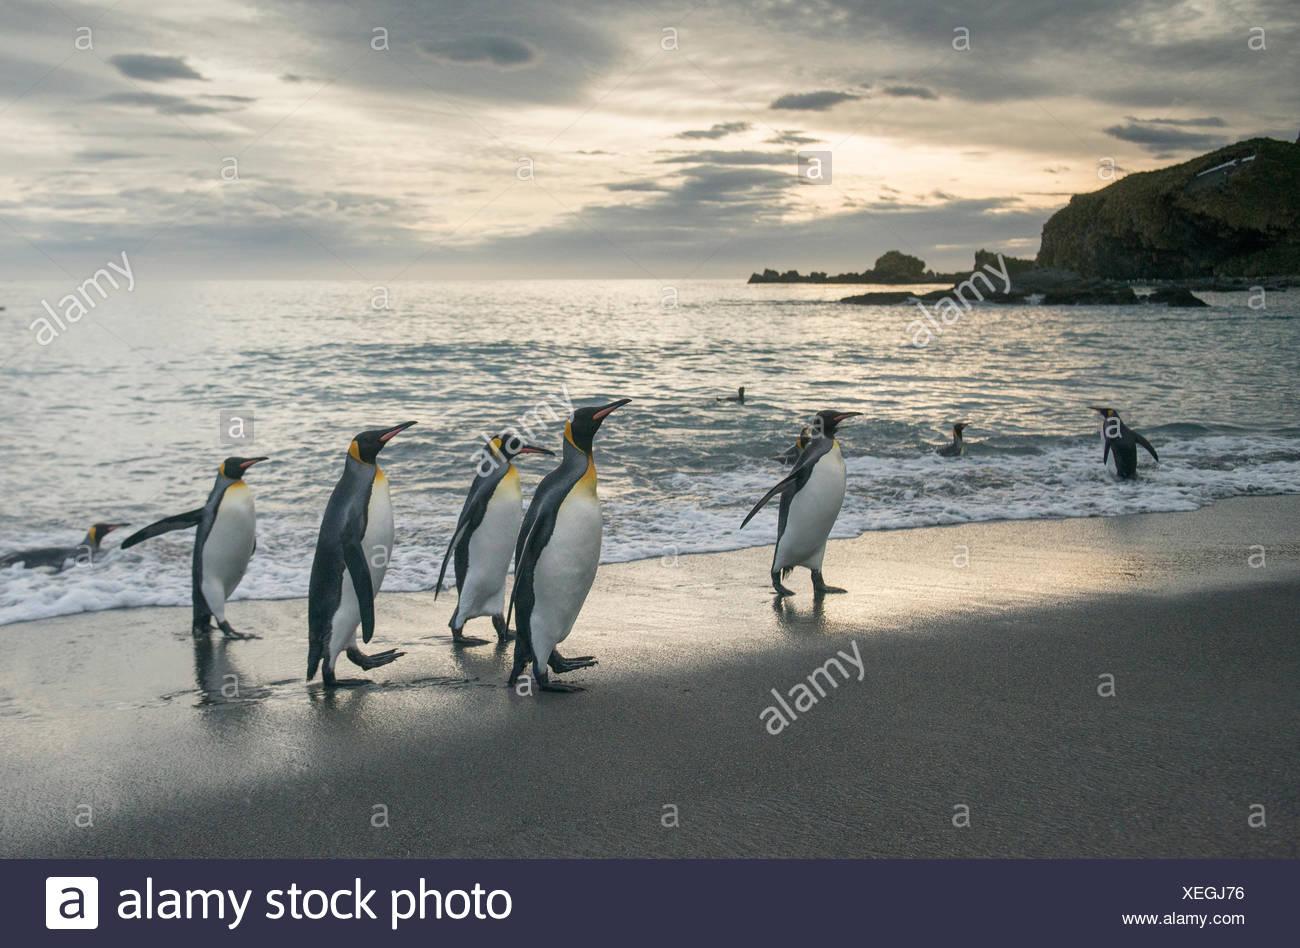 King penguins walk along the shoreline at sunrise at Gold Harbour. - Stock Image